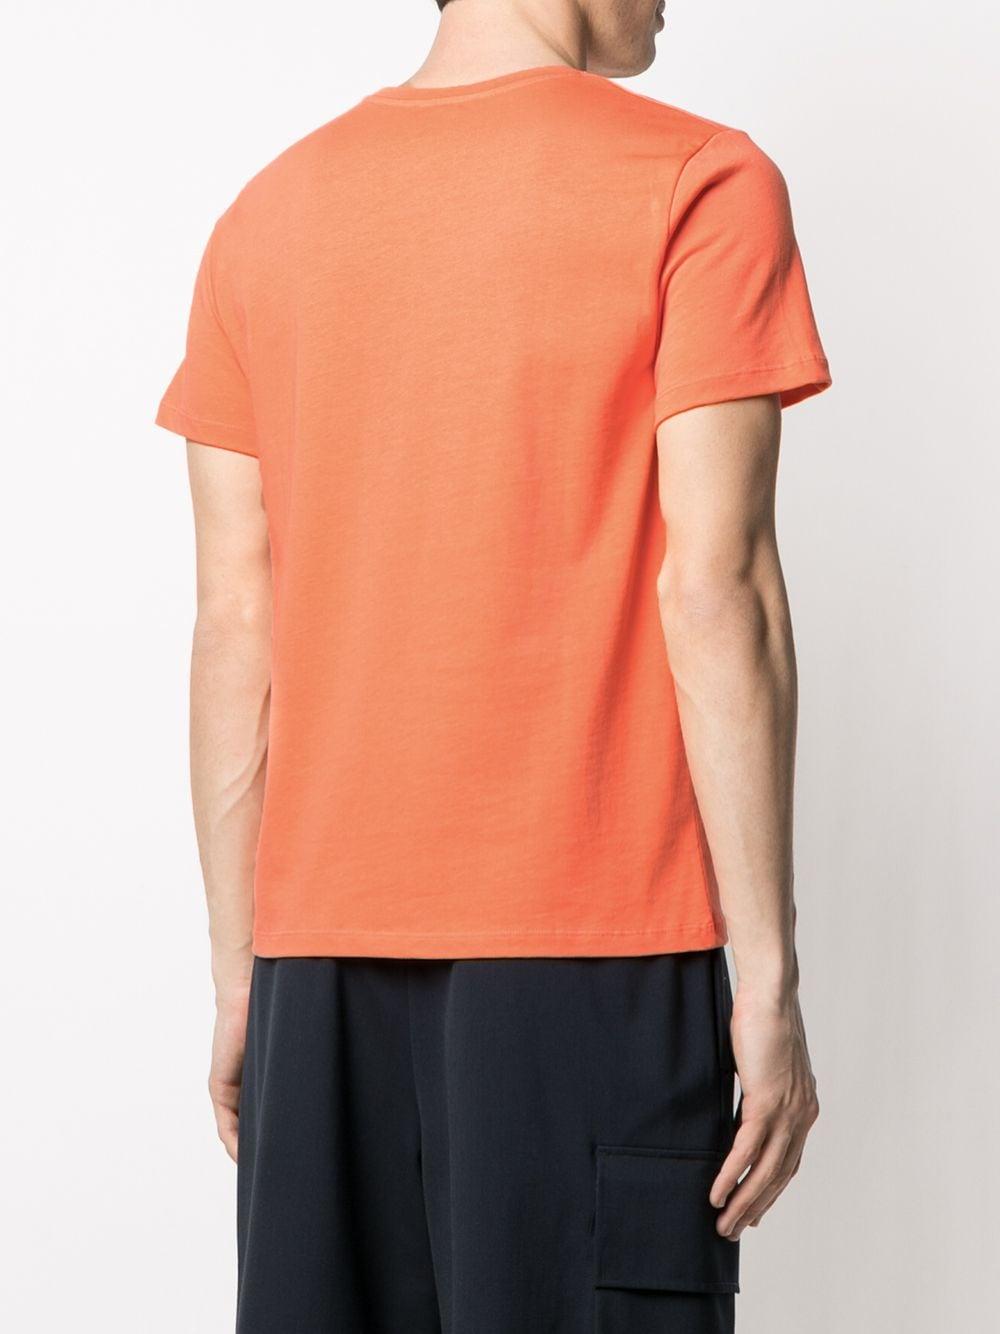 LOGO T-SHIRT A.P.C. | T-shirts | COEAV-H26840EAE